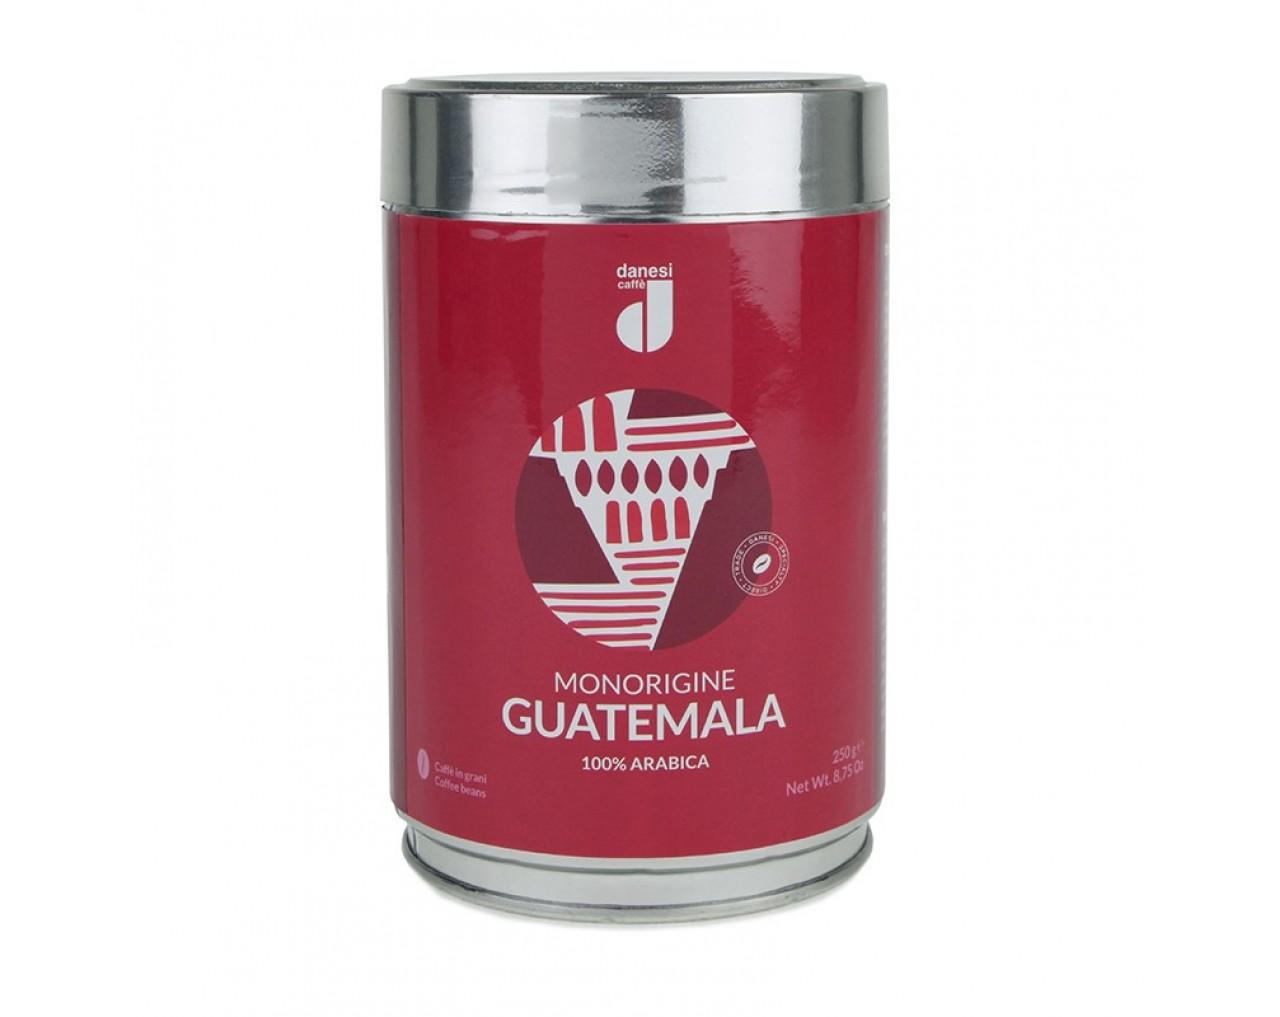 Danesi 100% Arabica Guatemala Single Origin (tin)